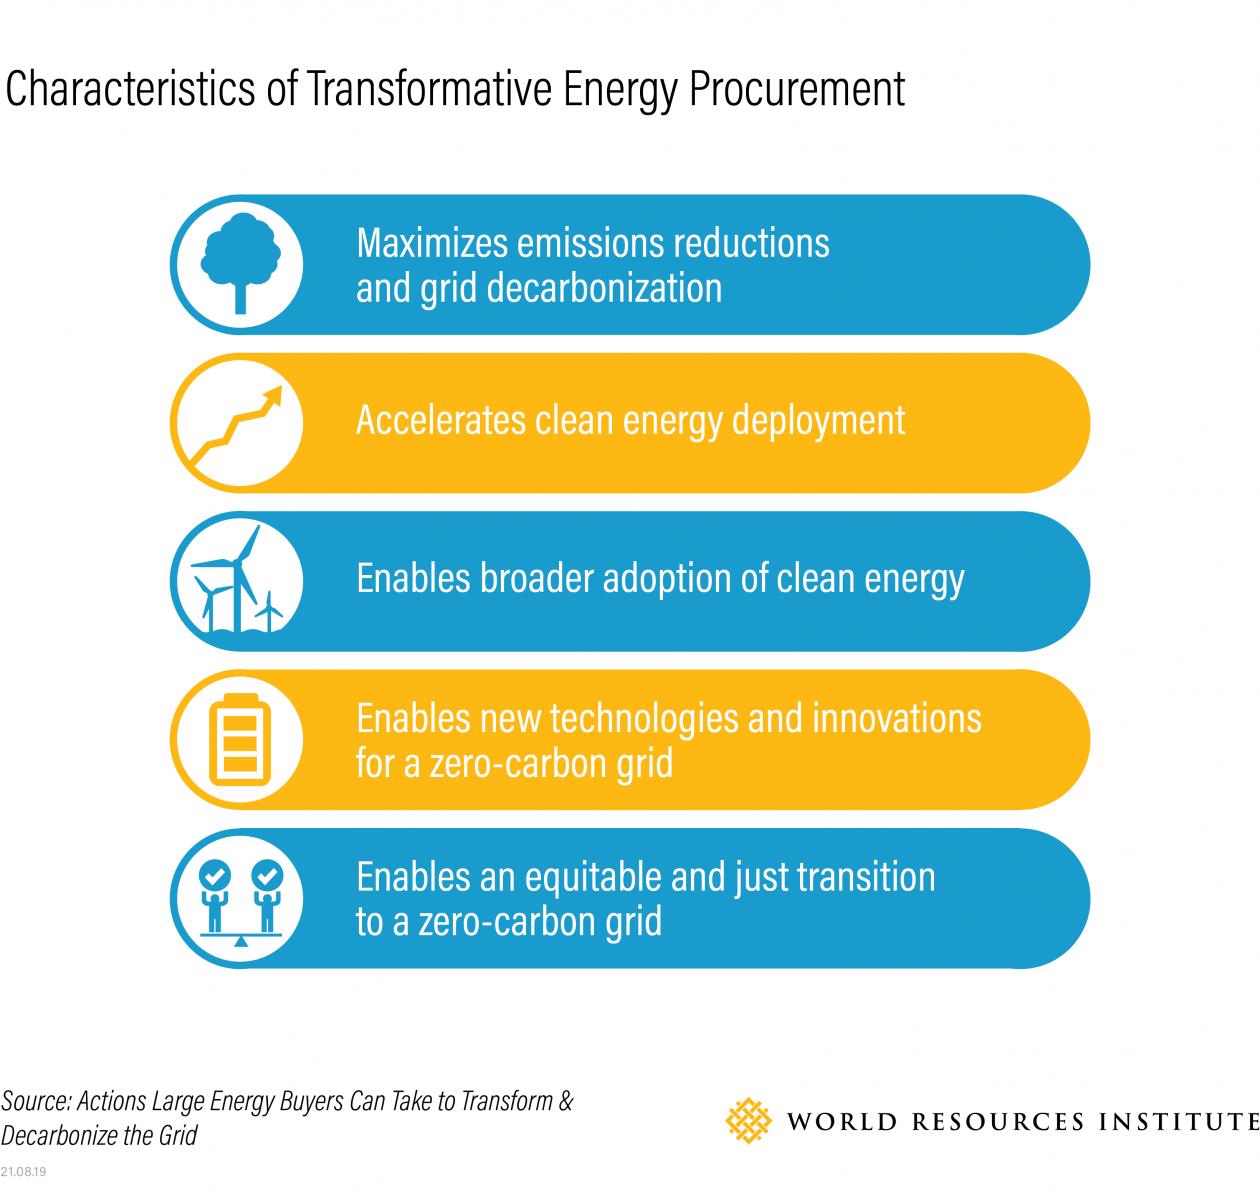 Transformative energy procurement